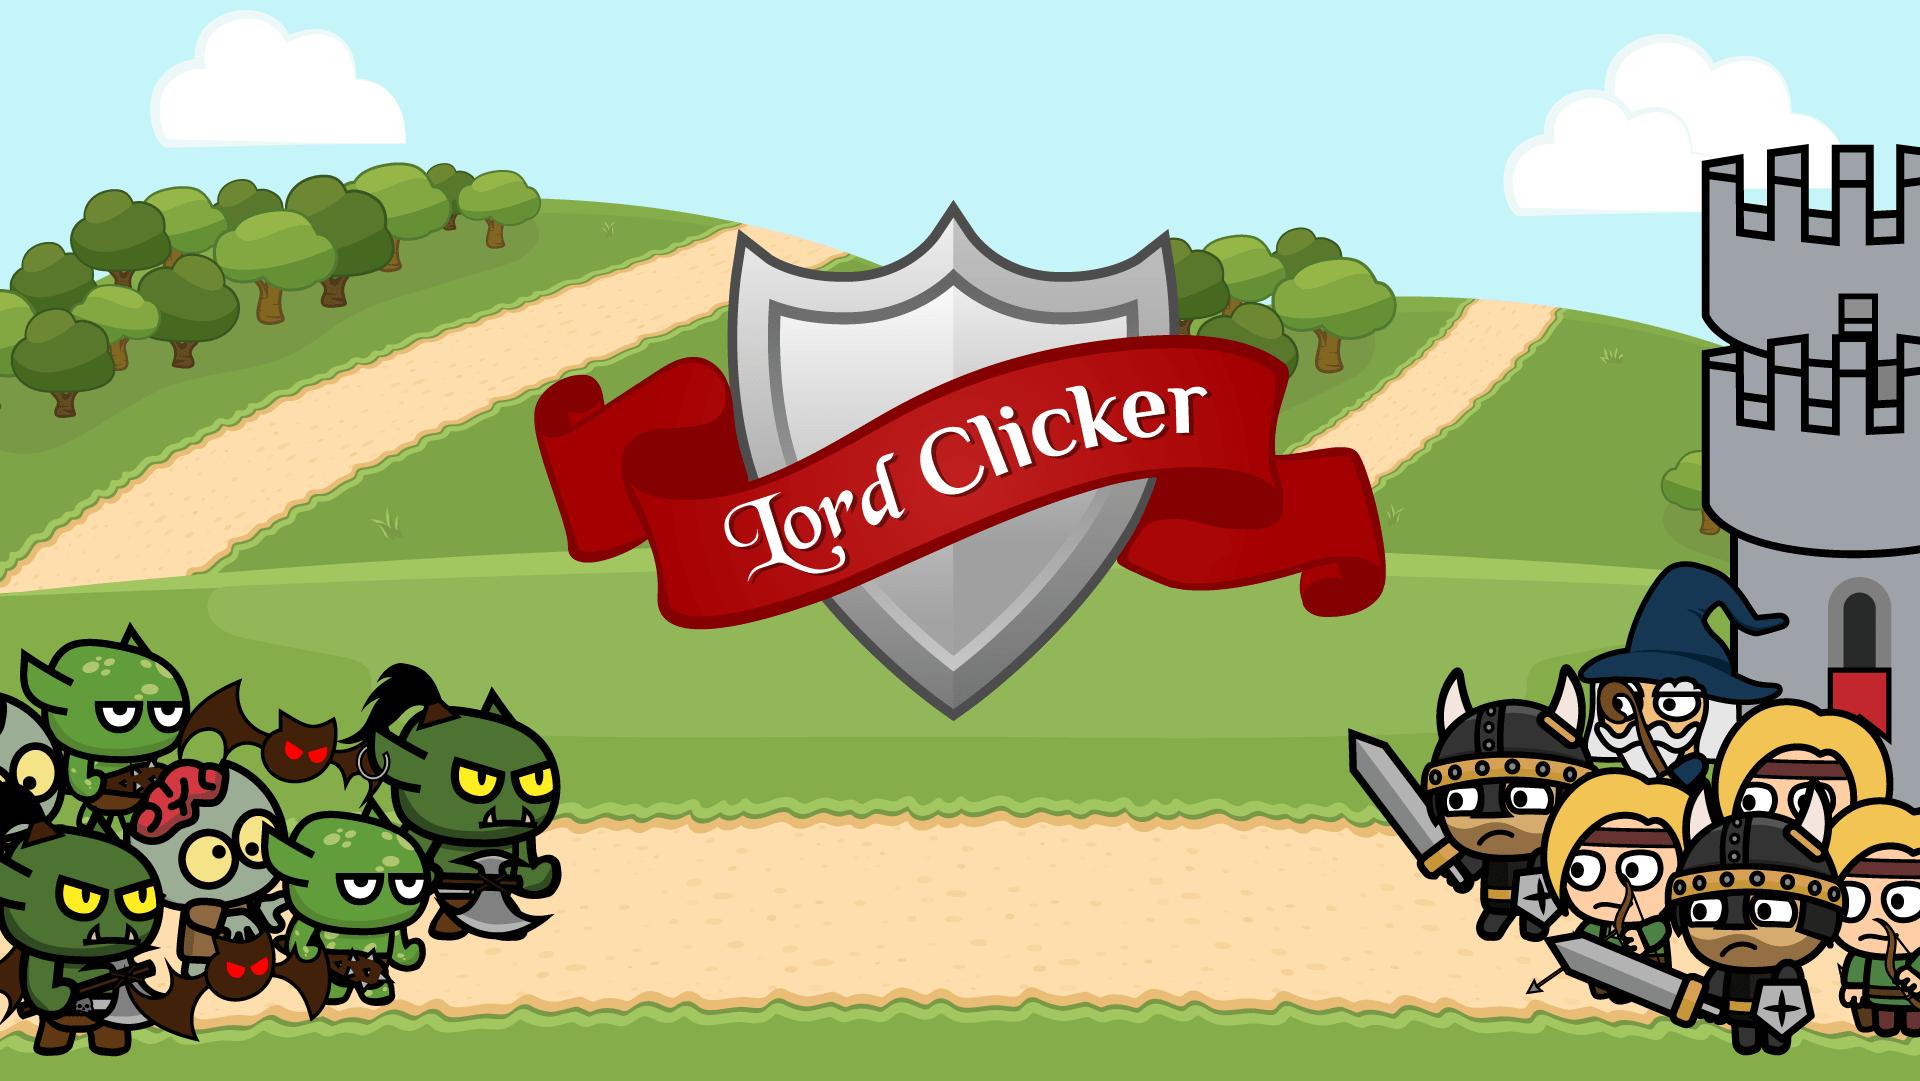 Lord Clicker, jeux vidéo